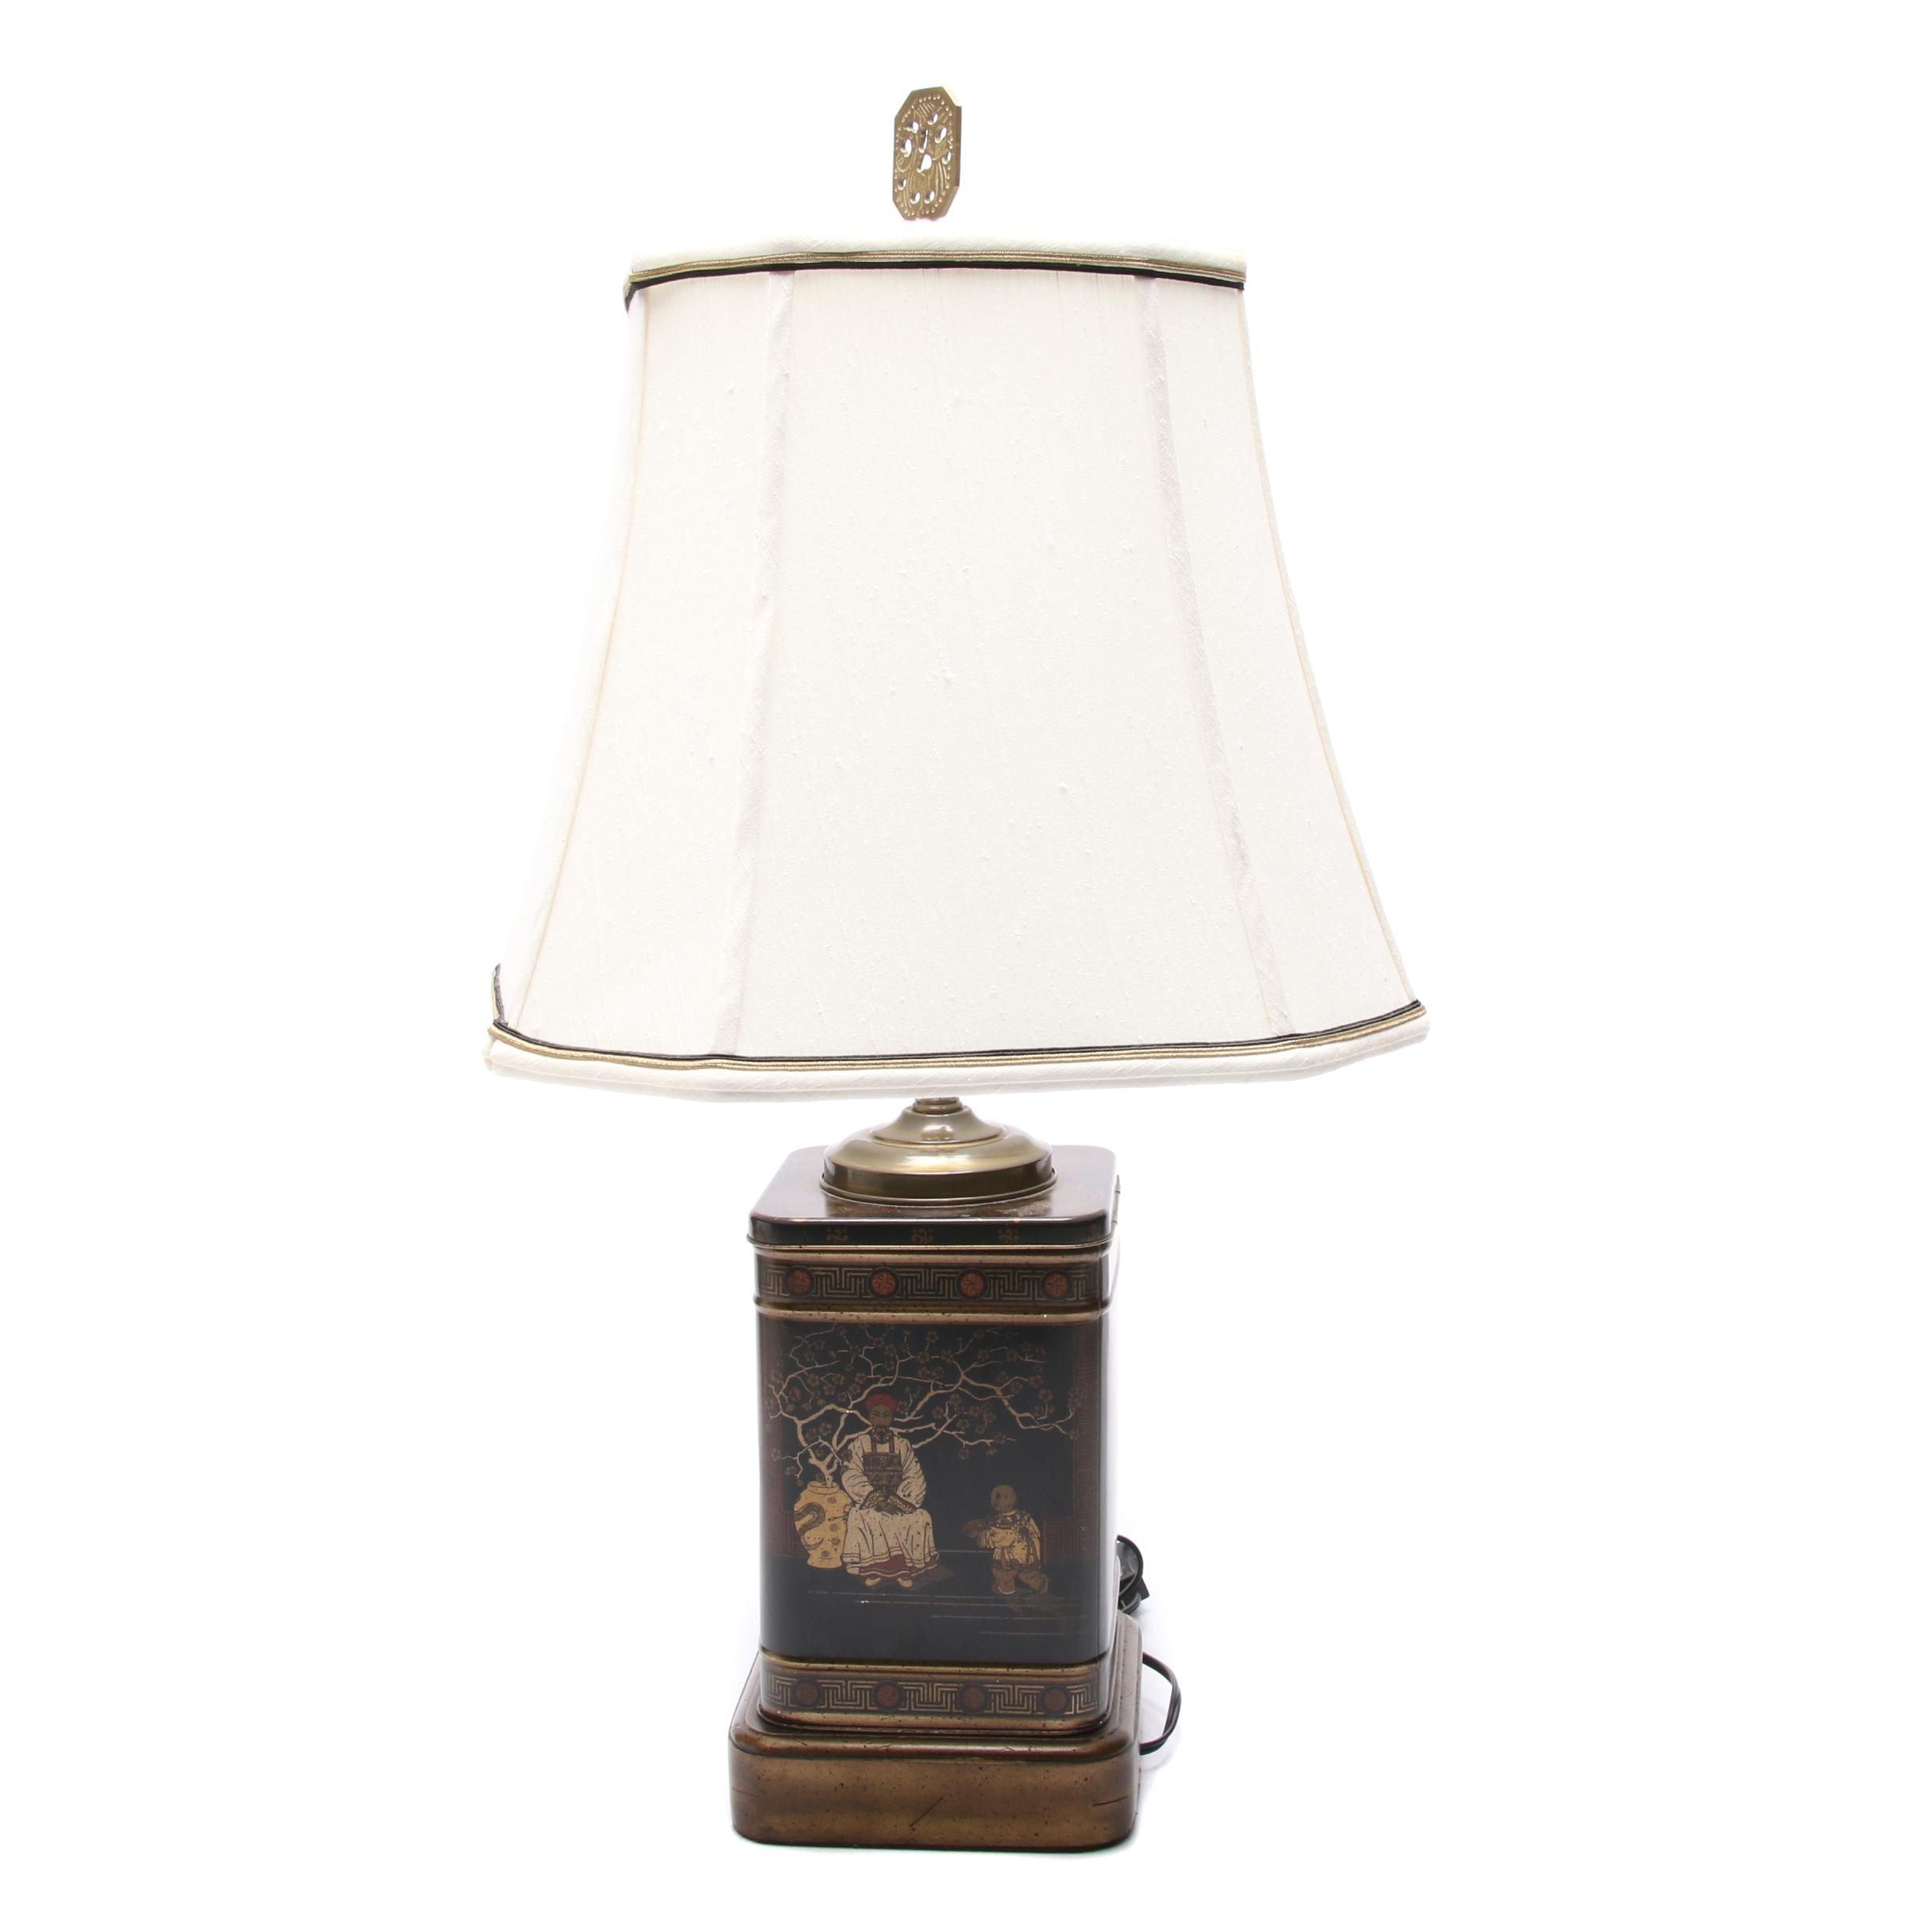 Chinoiserie Tin Box Table Lamp